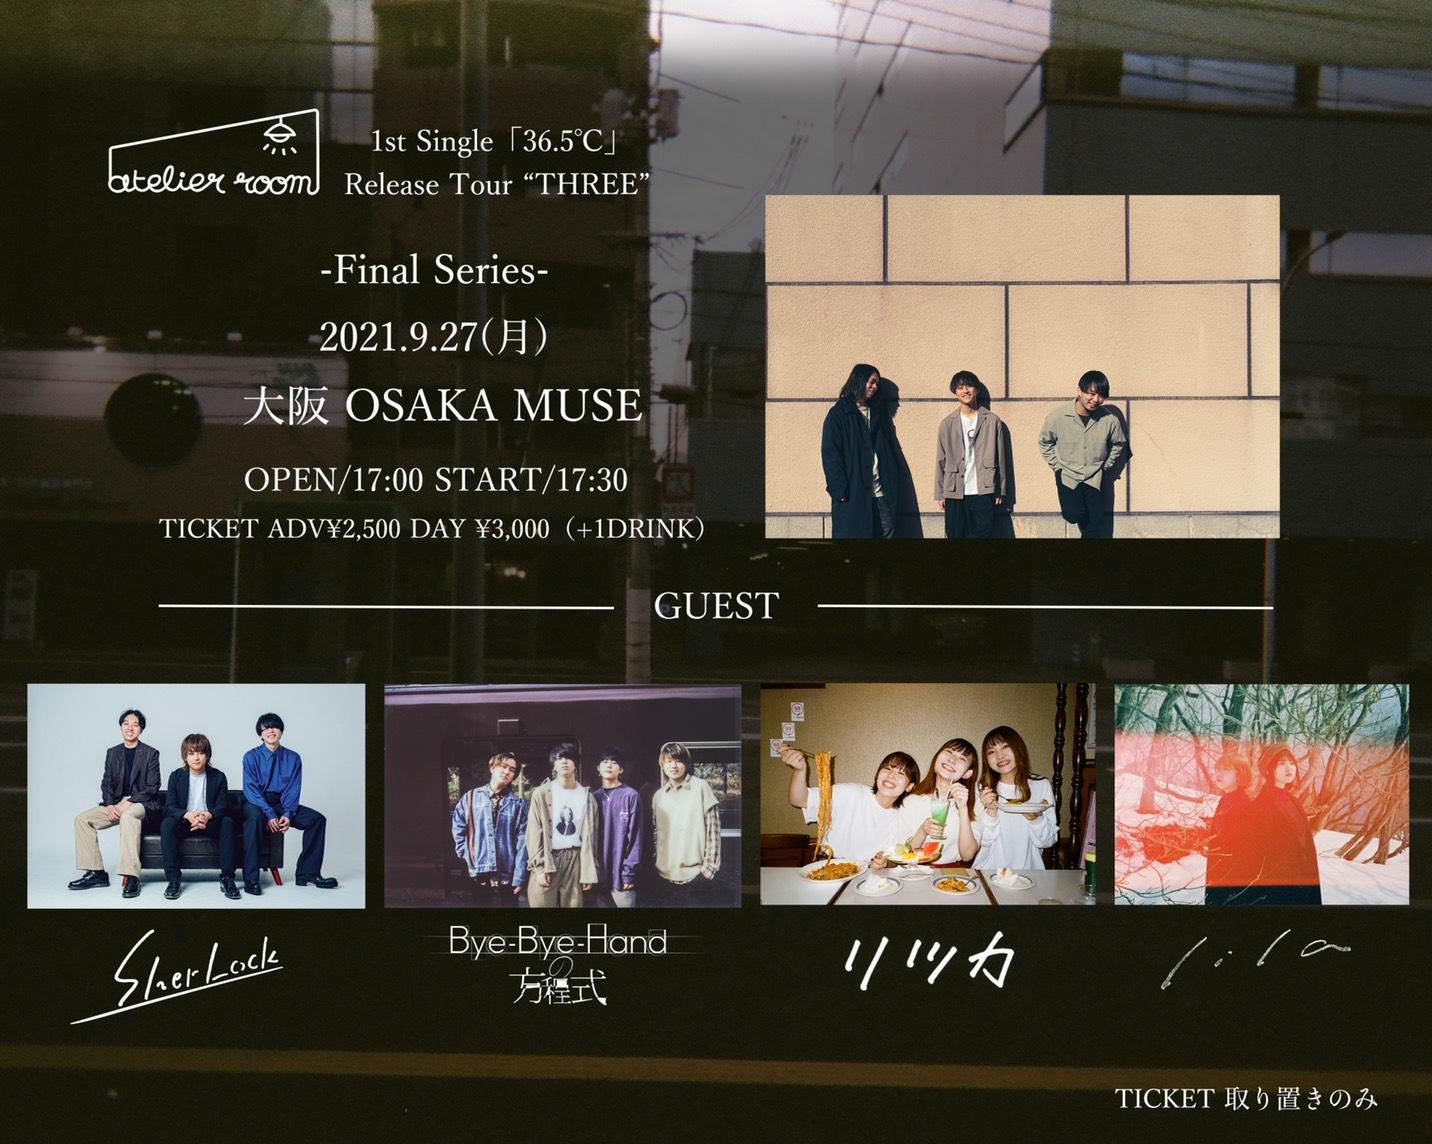 "atelier room 1st Single 「36.5℃」Release Tour ""THREE"" Final Series 大阪編"